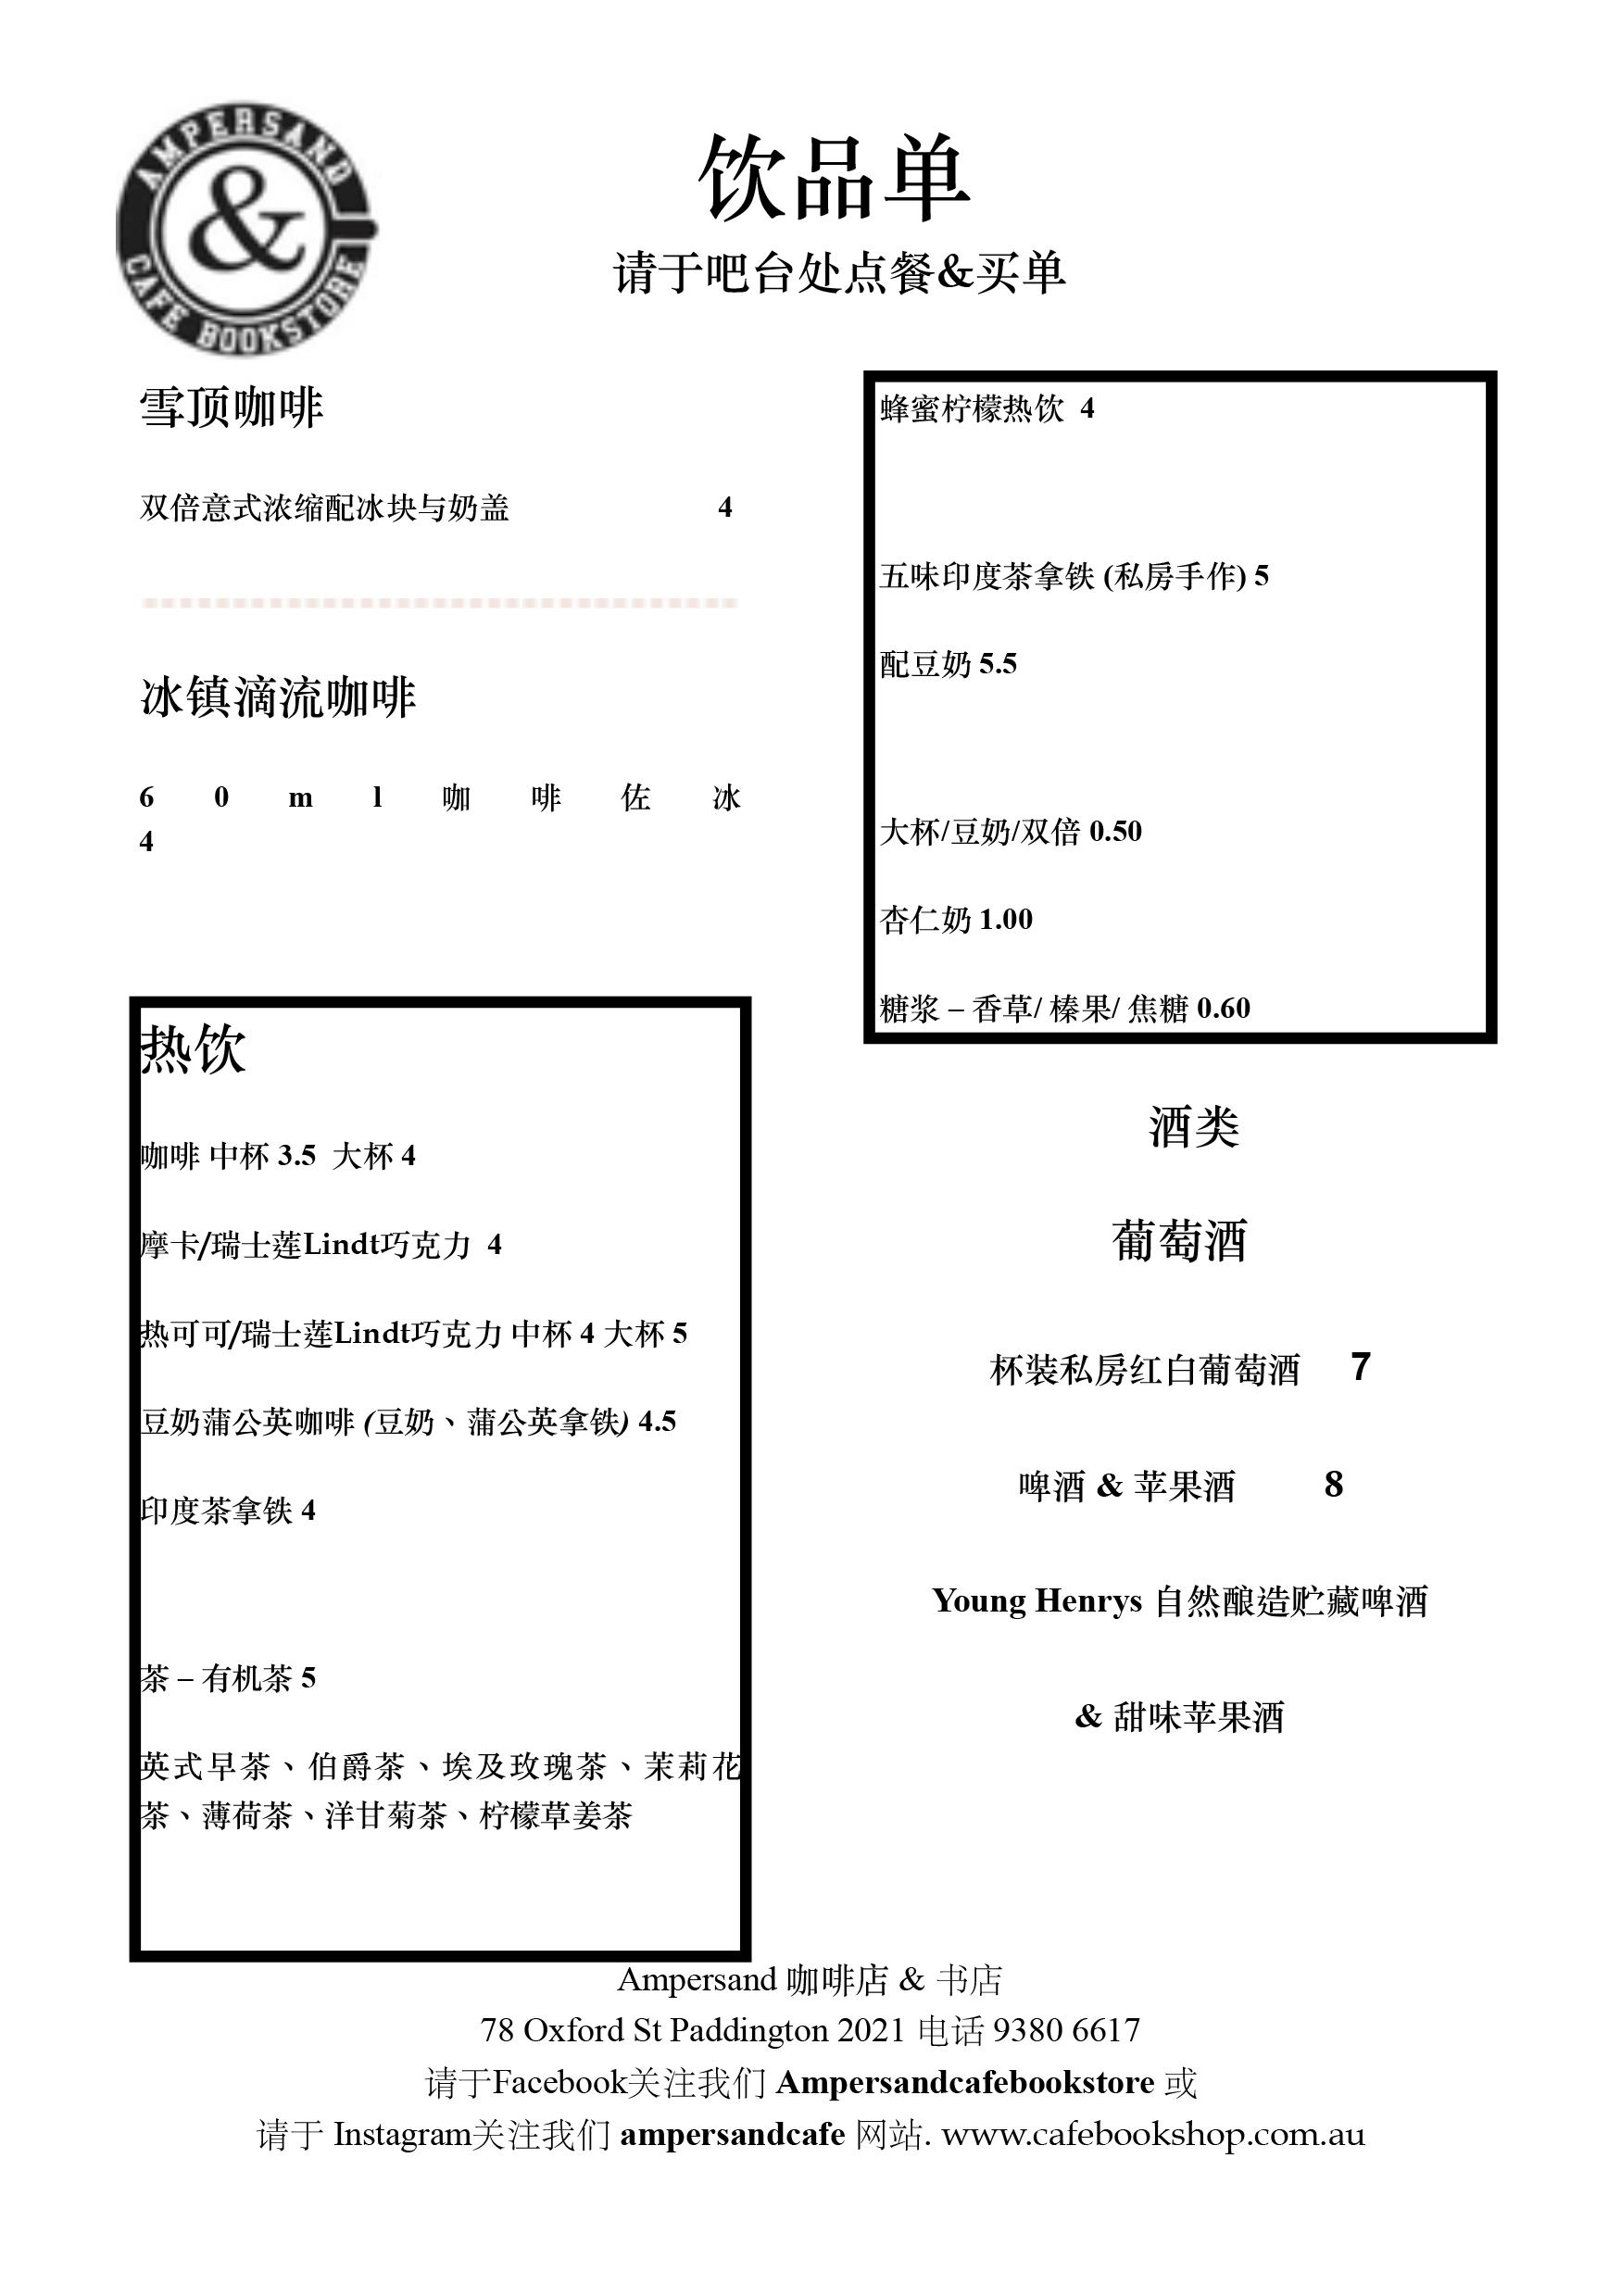 AMPERSAND-MENU-CH-4.png